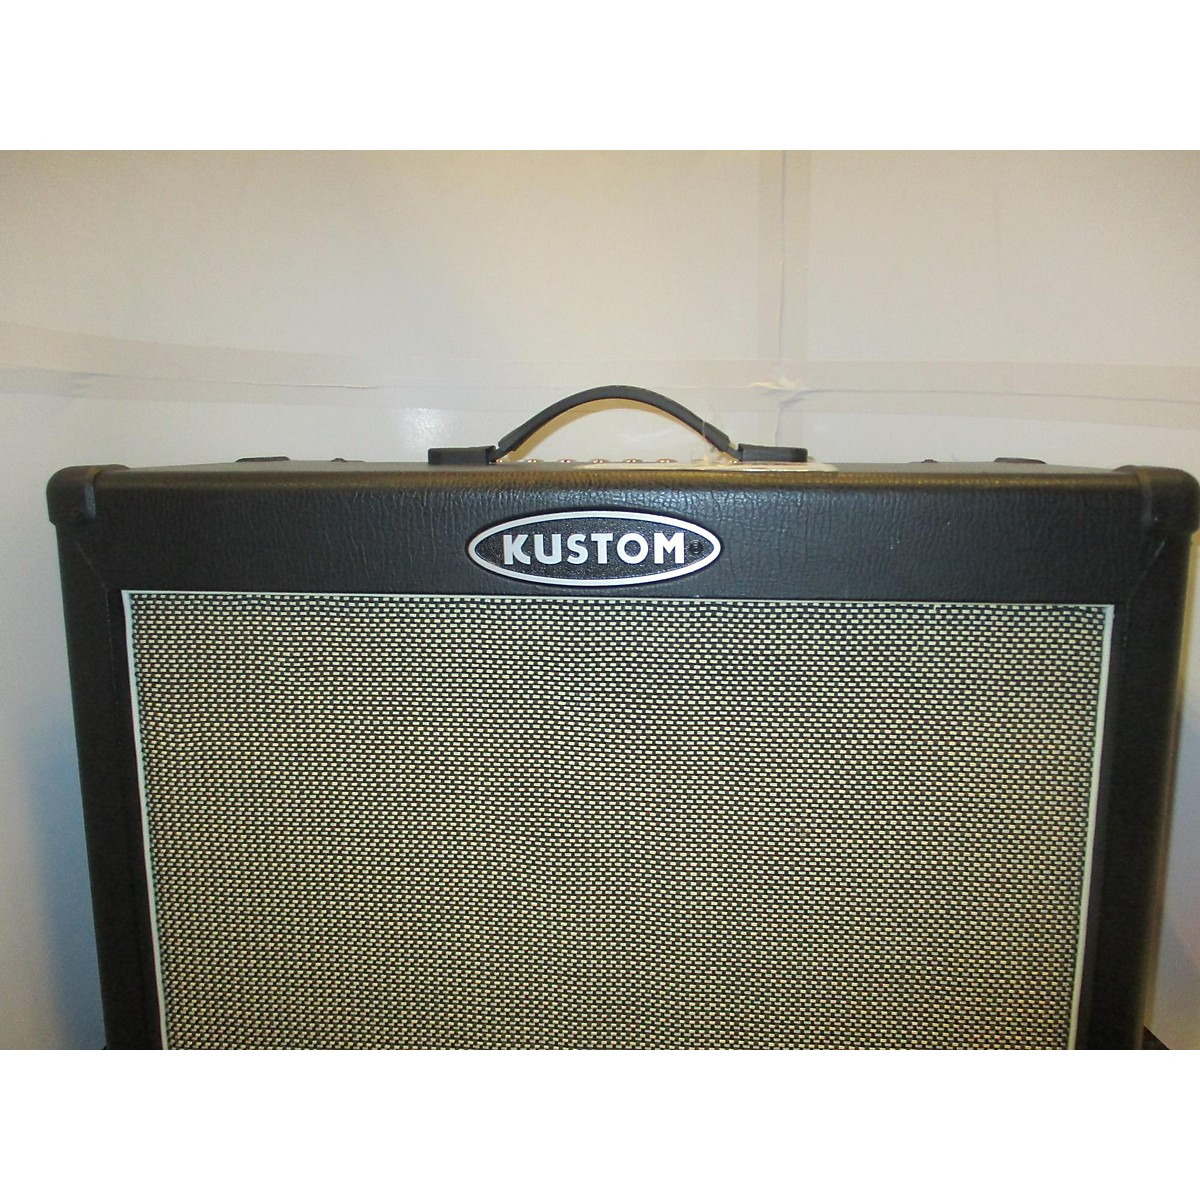 Kustom 1970s 250 Head And Cab Guitar Combo Amp